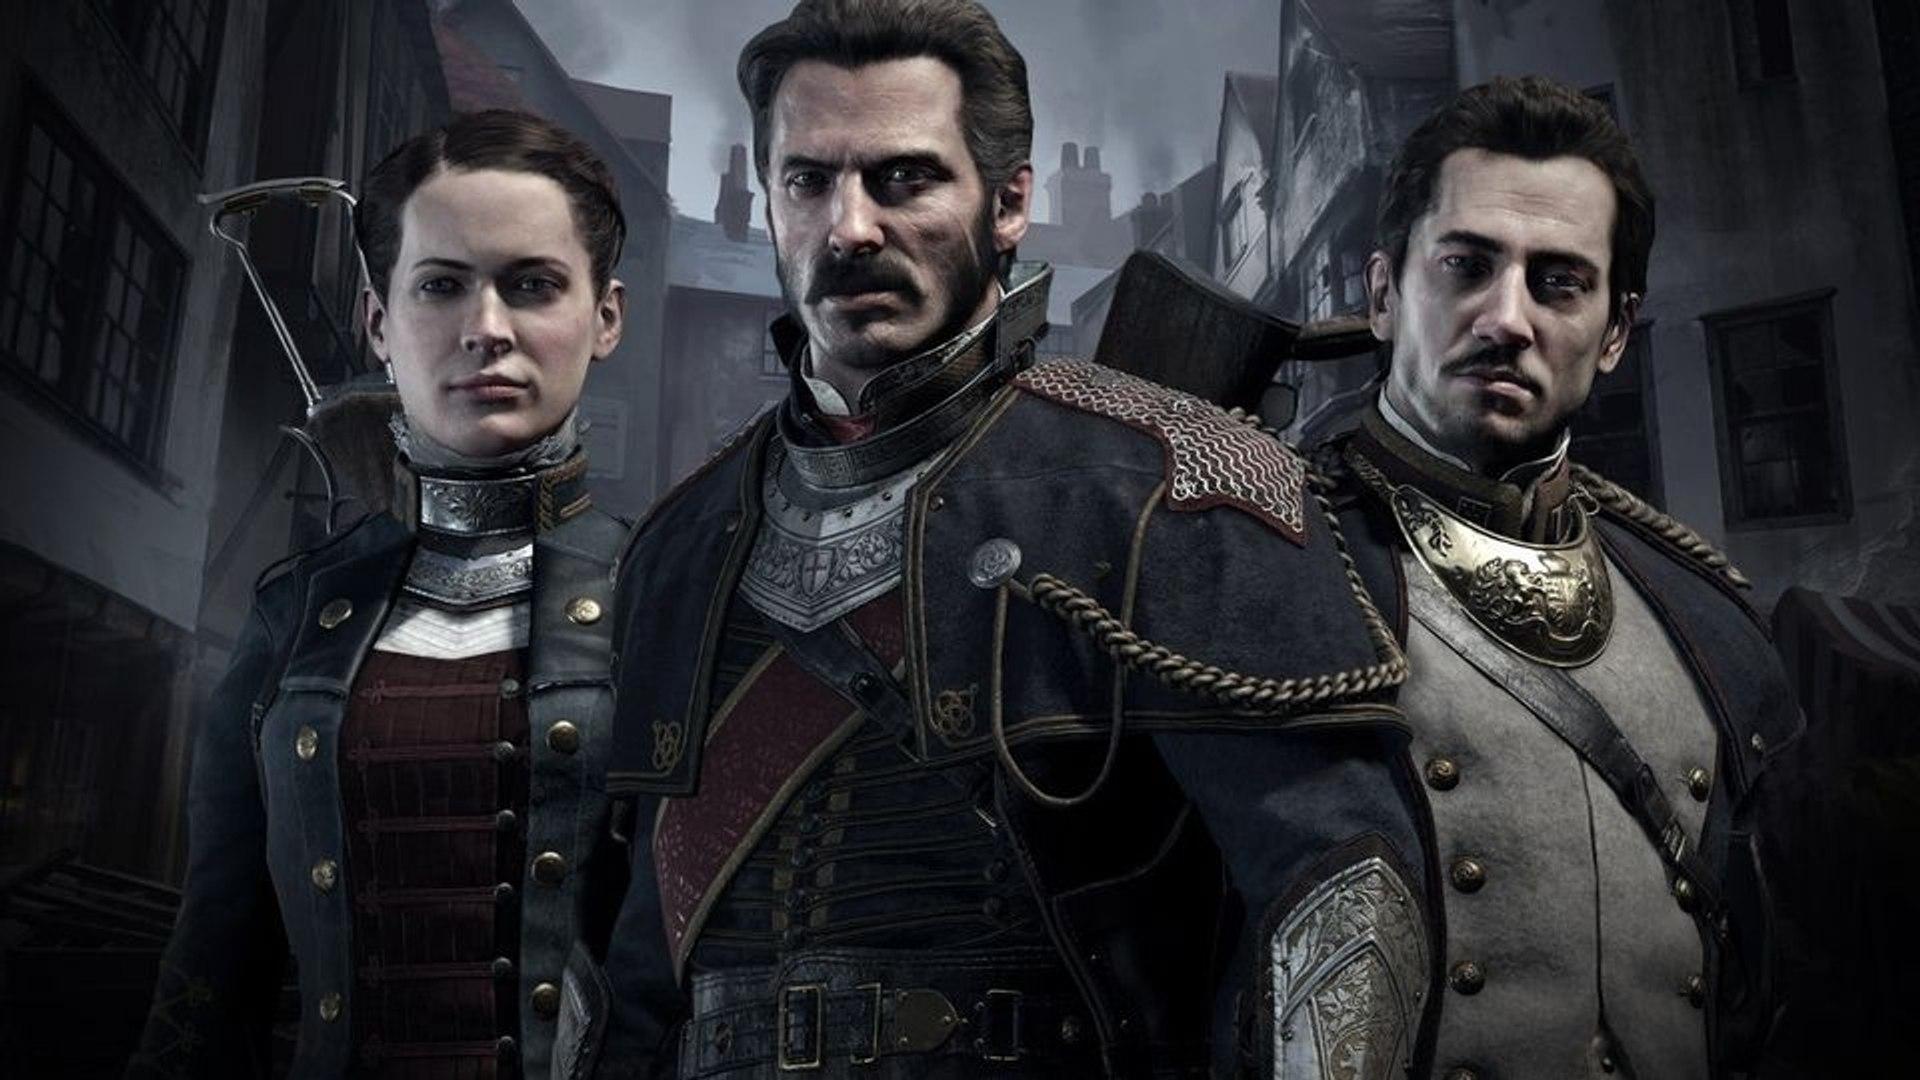 The Order: 1886 deserved a sequel even if the original wasn't great |  GamesRadar+